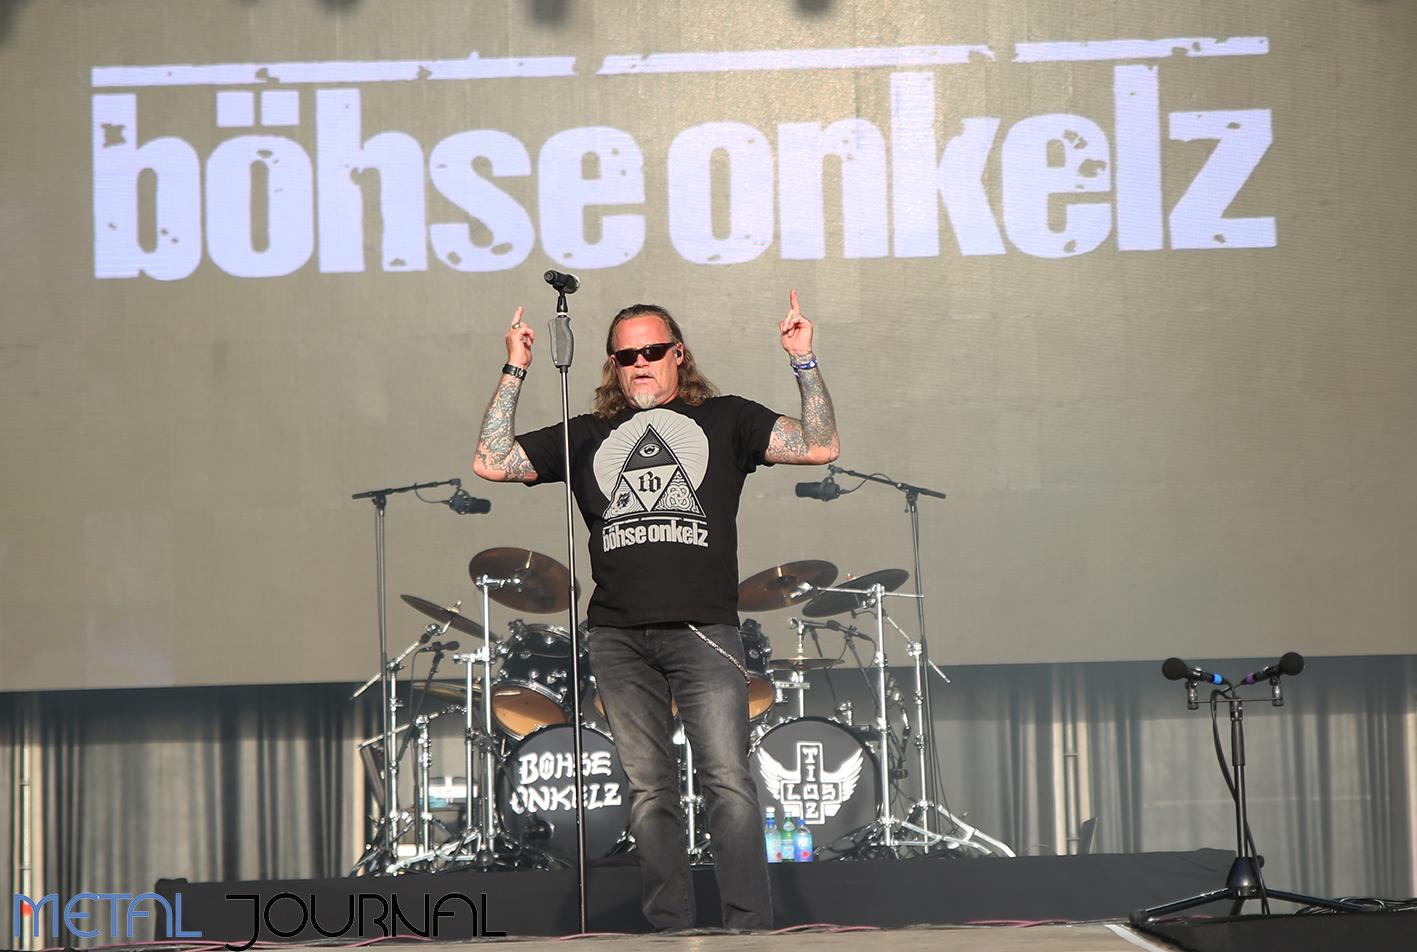 bohse onkelz - metal journal rock fest barcelona 2019 pic 3